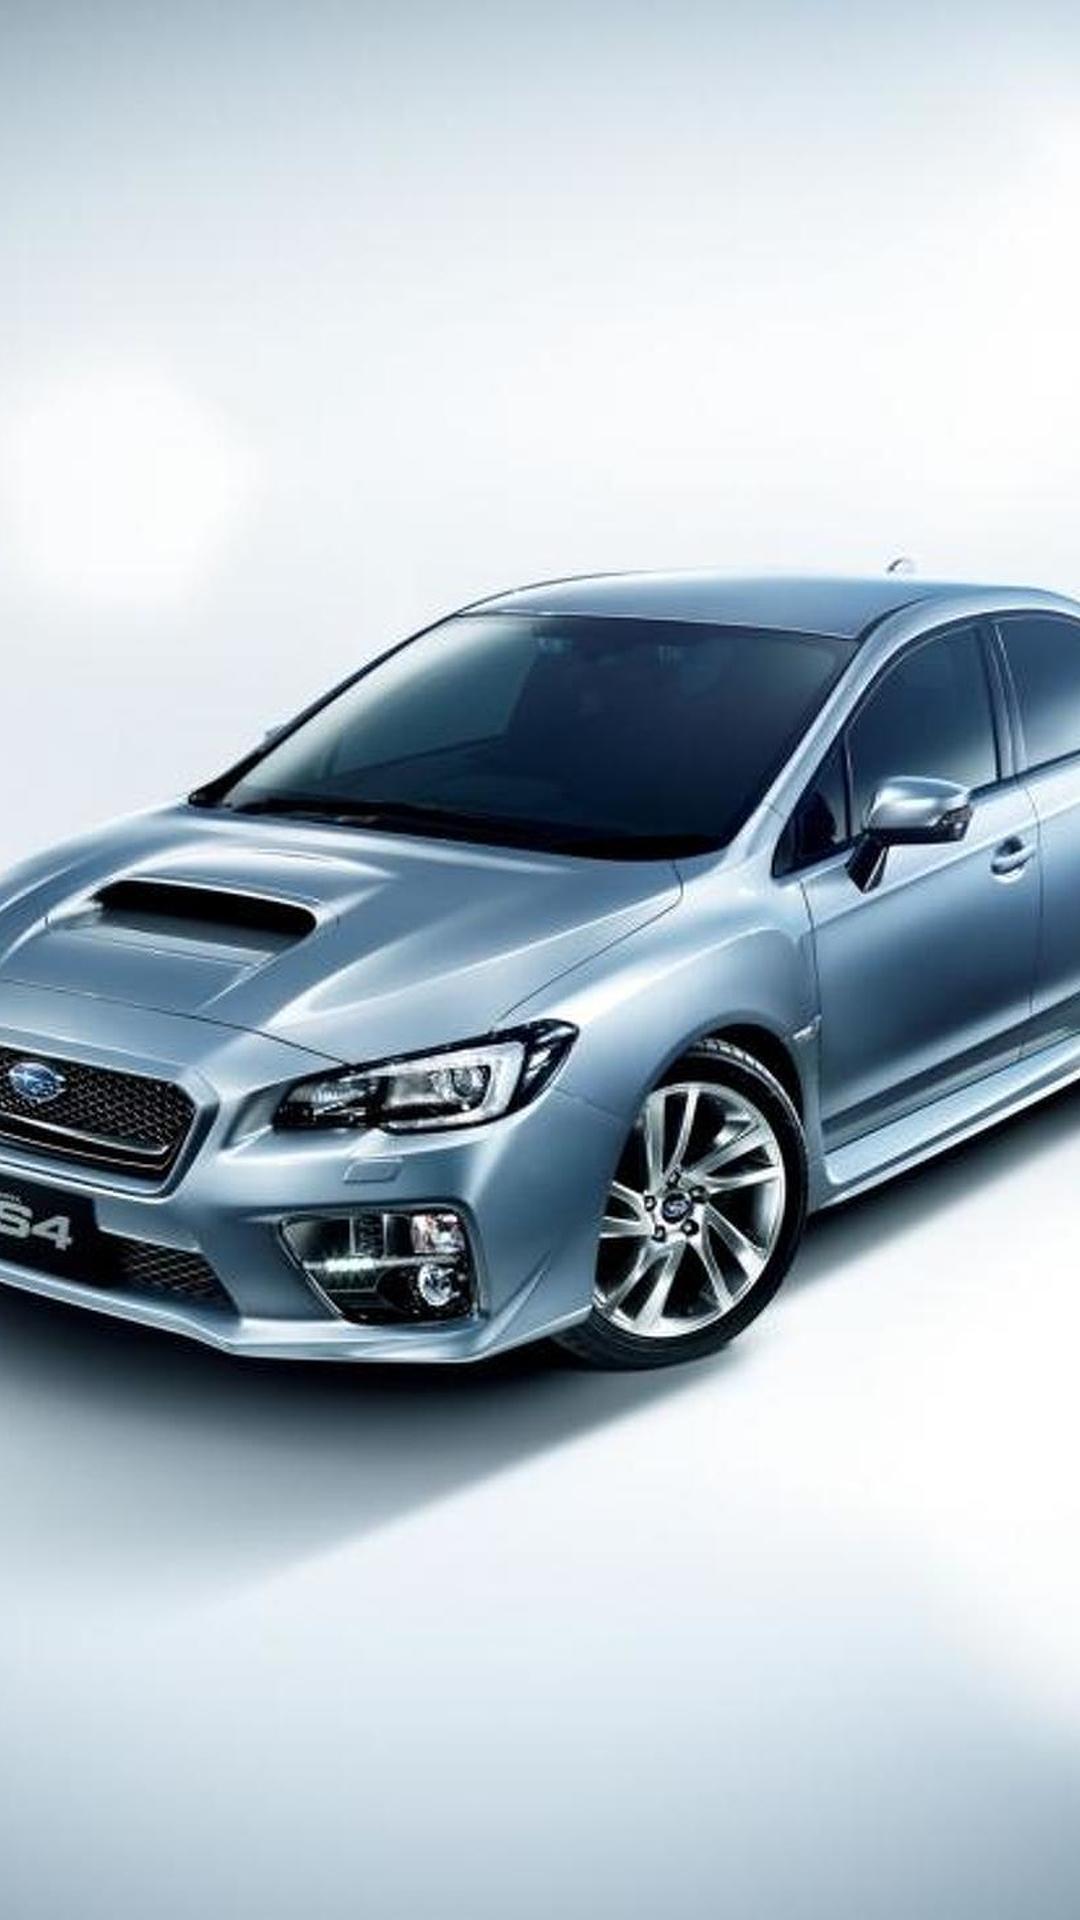 Subaru introduces WRX S4 in Japan